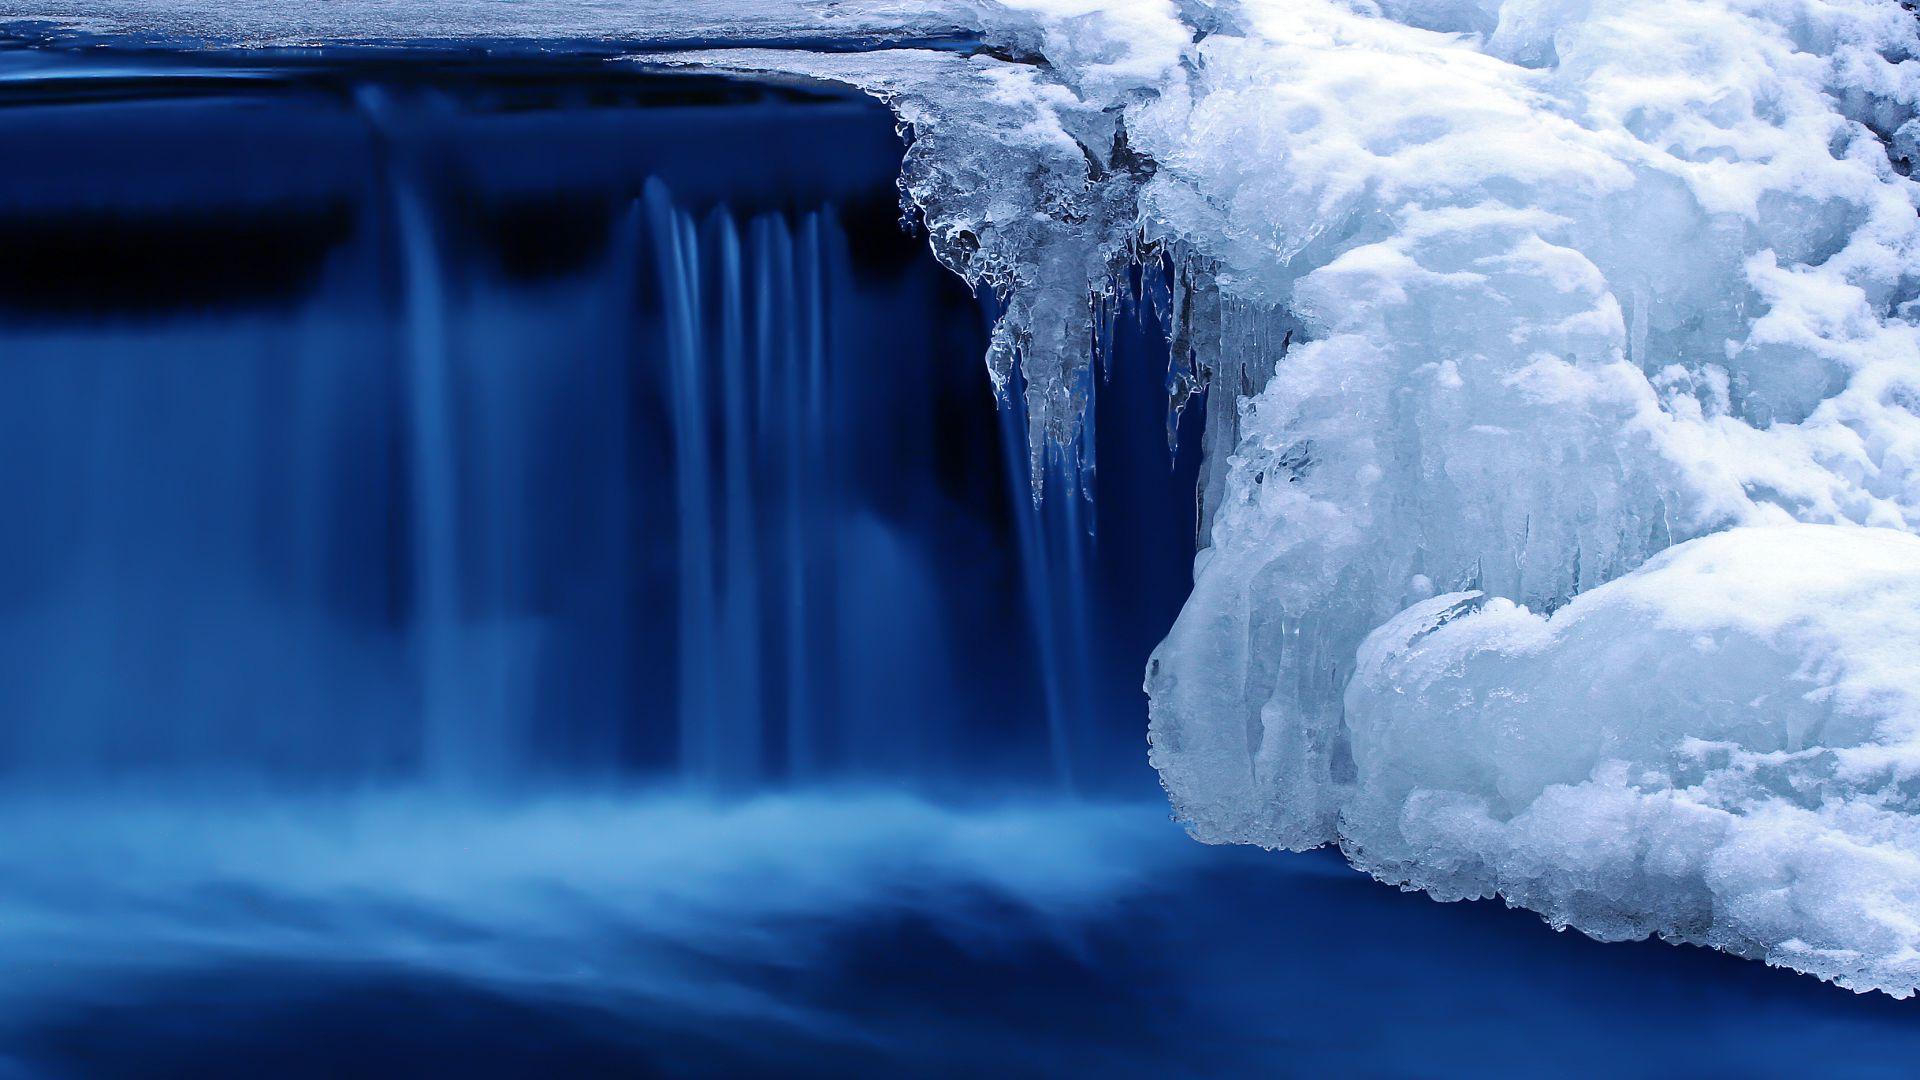 Lake 4k HD Wallpaper Waterfall Water Snow Ice Horizontal